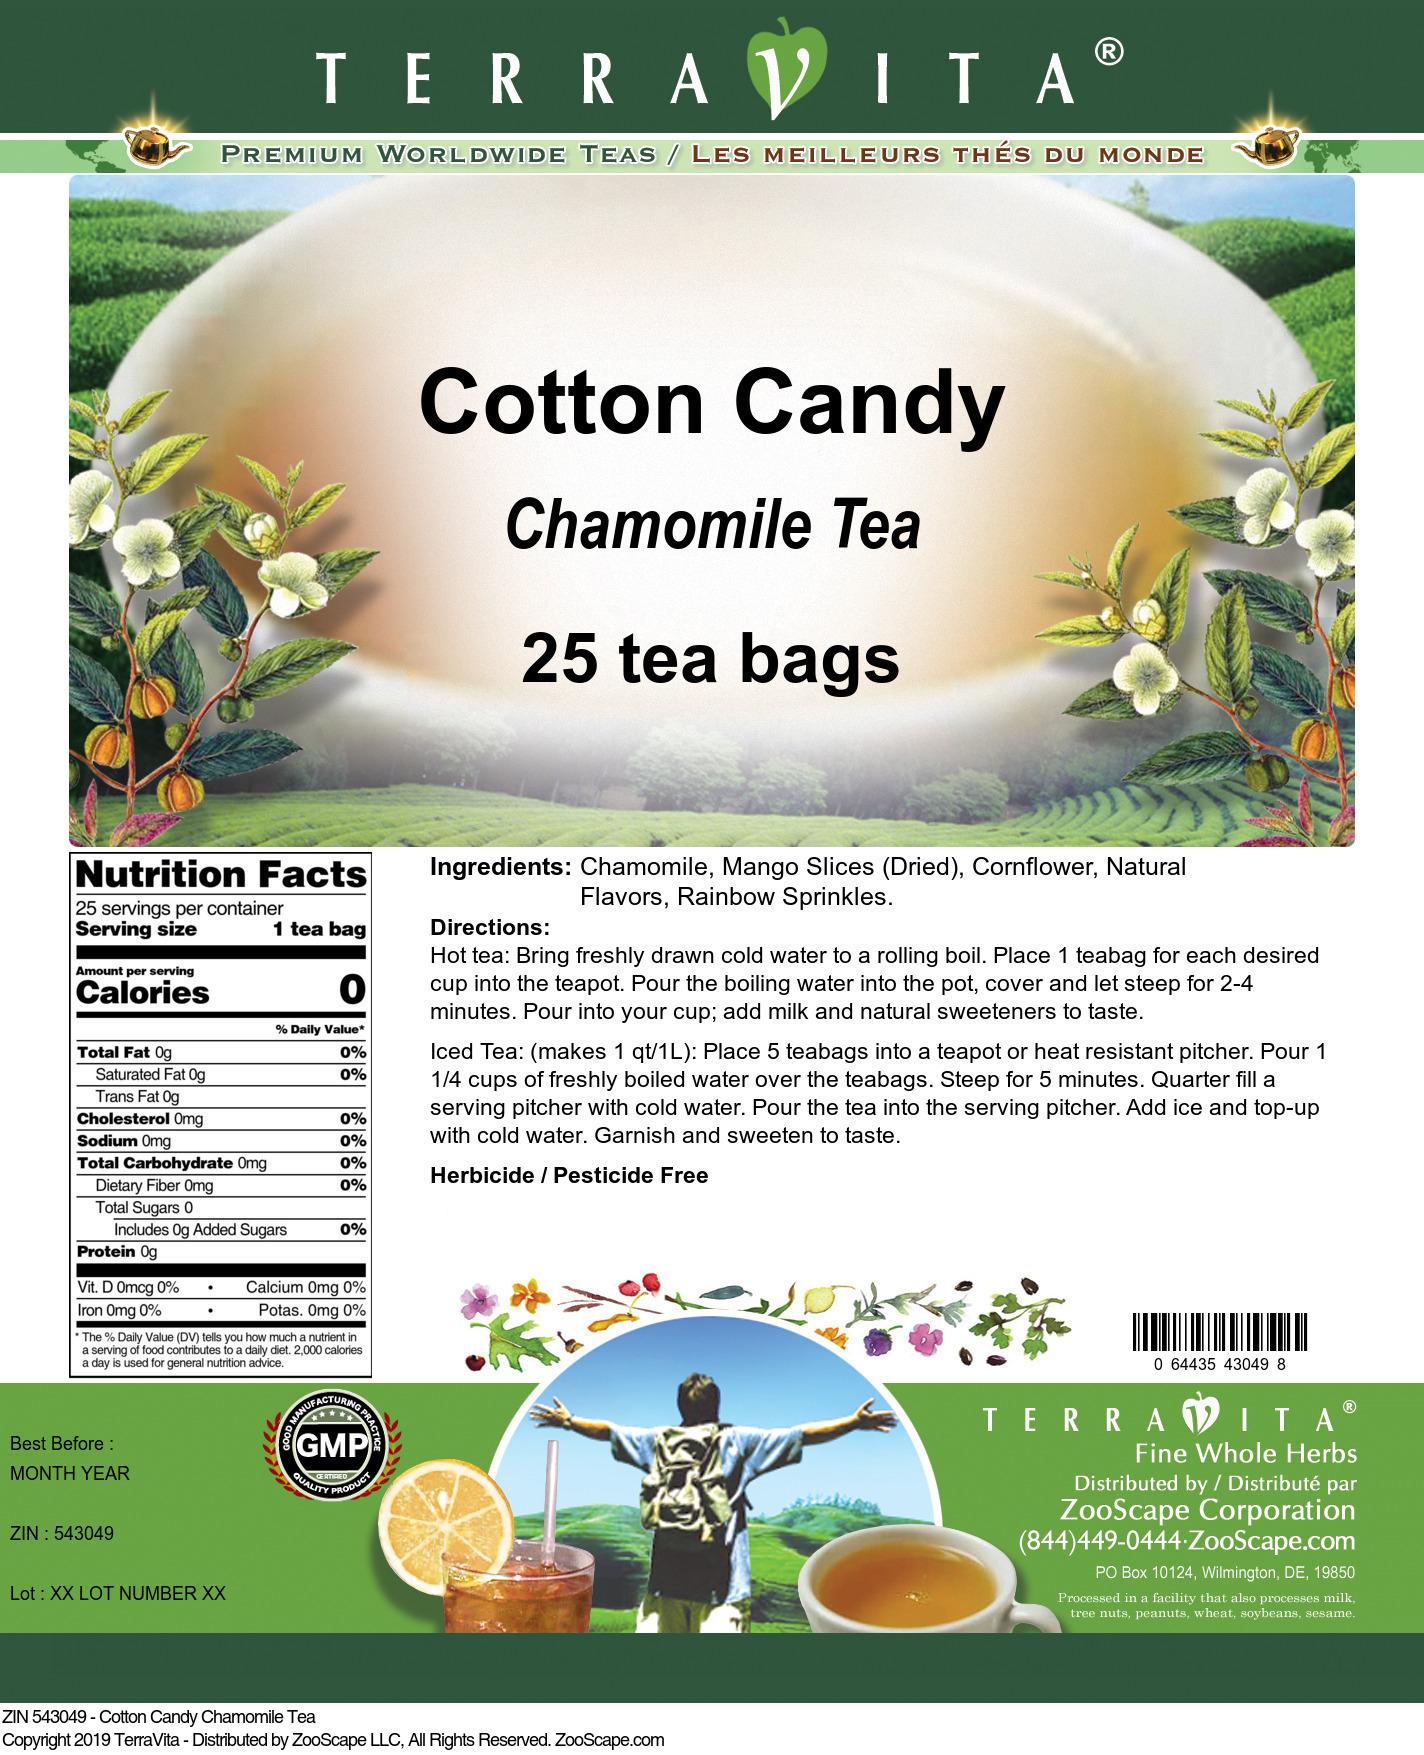 Cotton Candy Chamomile Tea